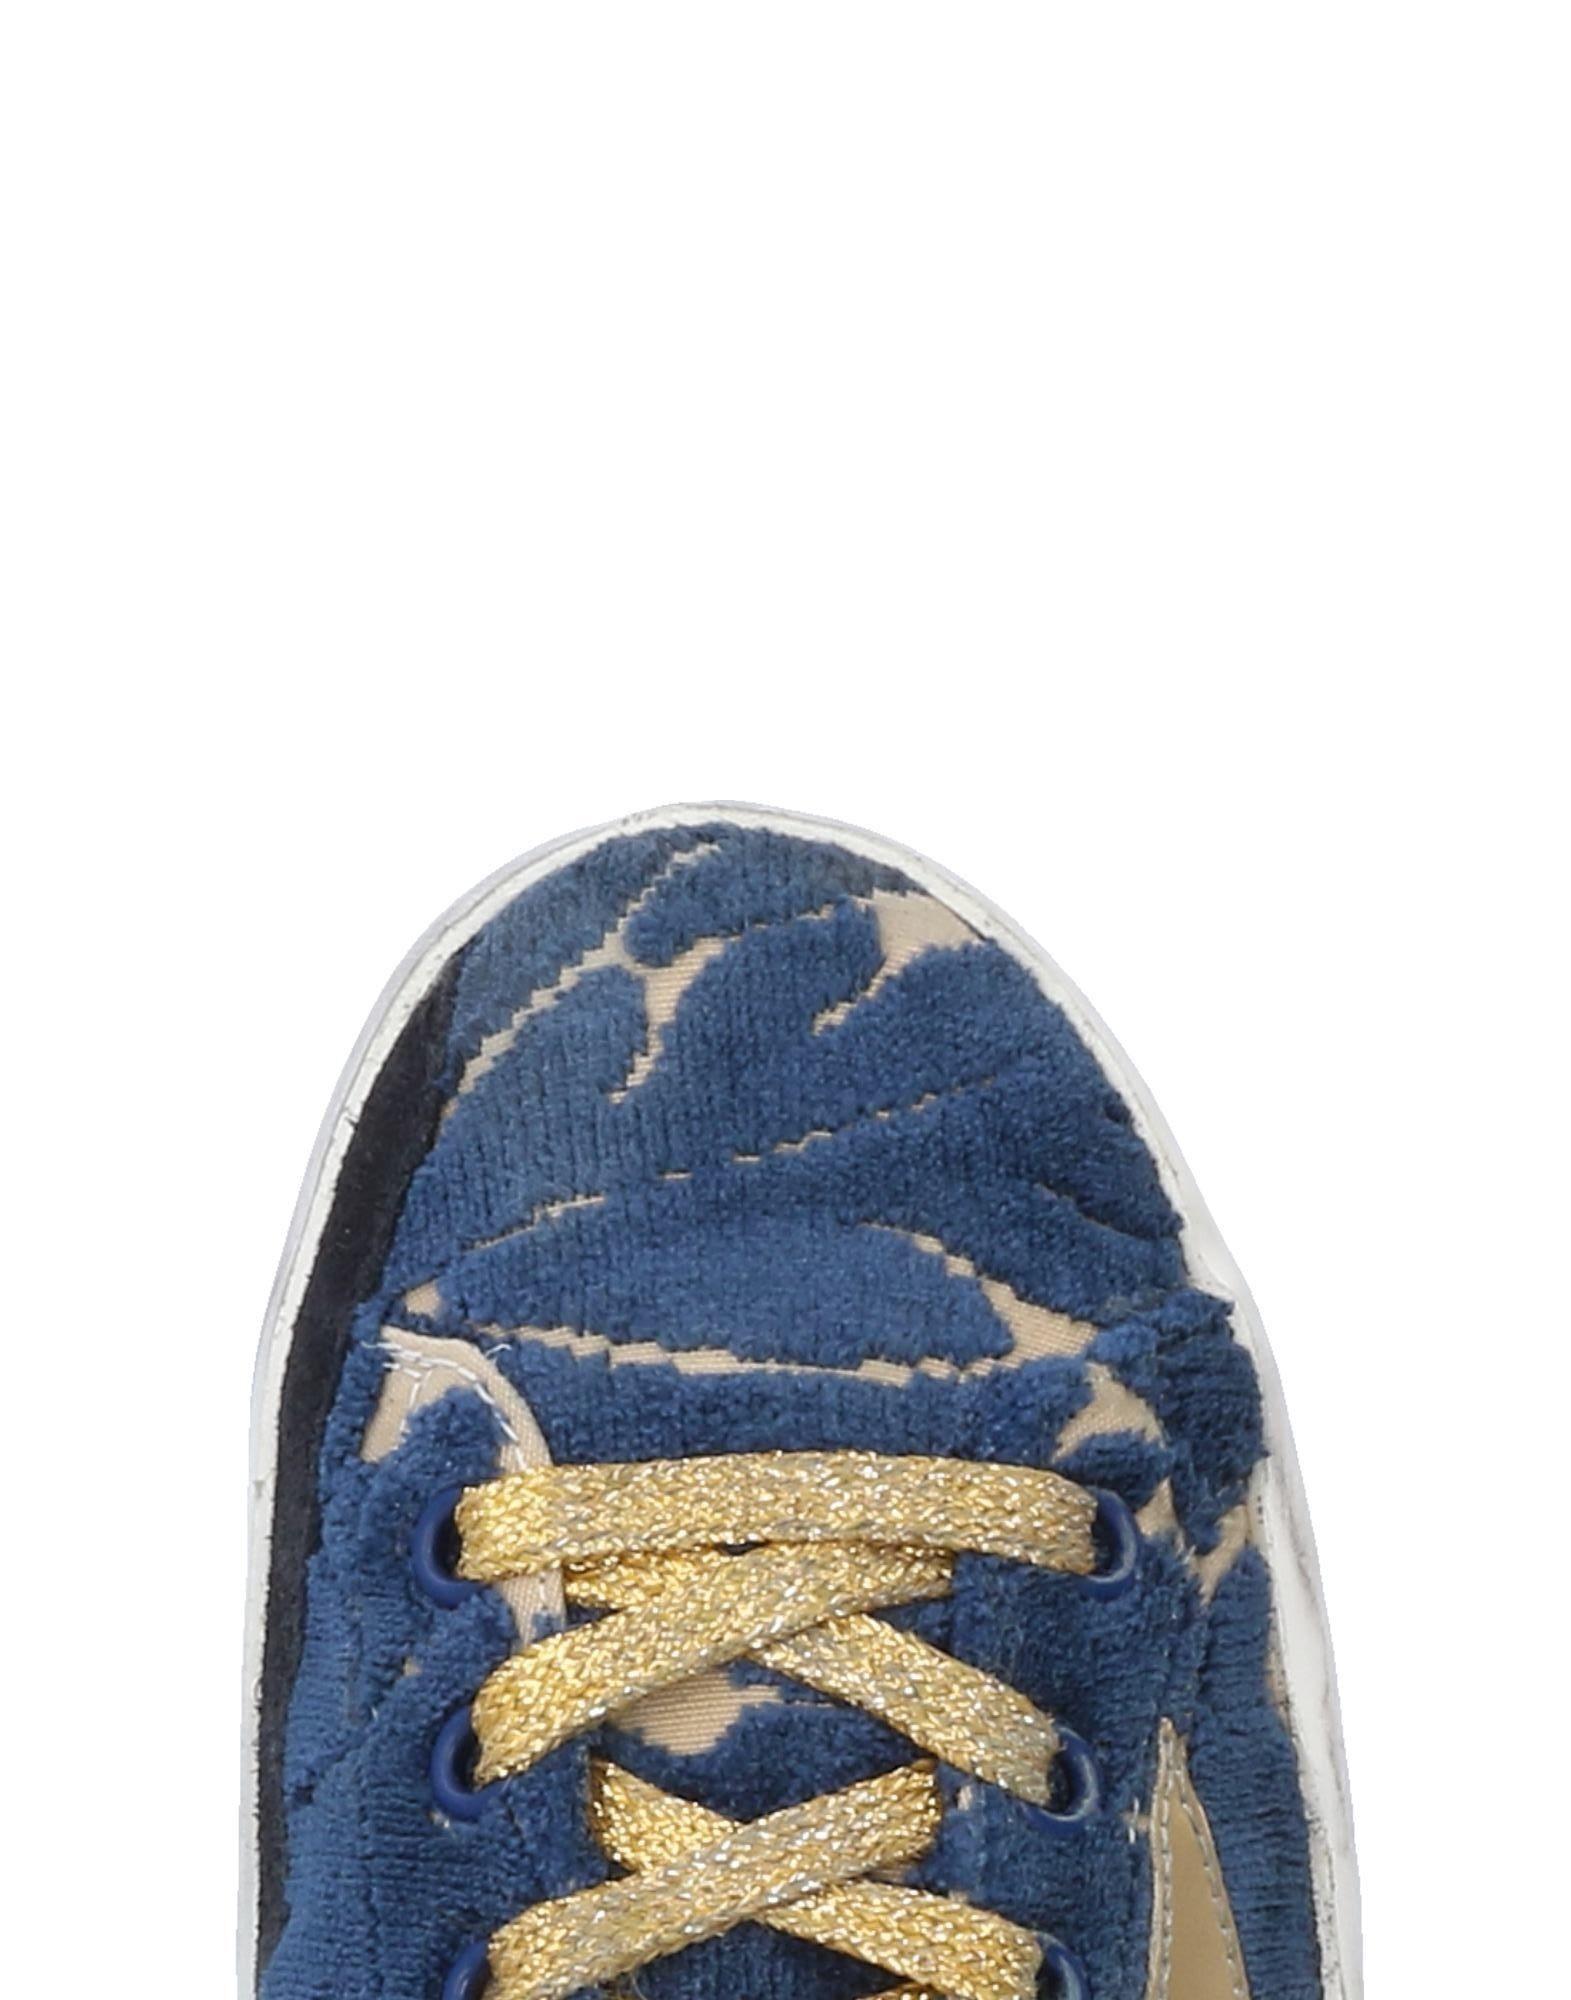 Golden Goose Deluxe Brand Sneakers - Women Women Women Golden Goose Deluxe Brand Sneakers online on  United Kingdom - 11459364RI db0279